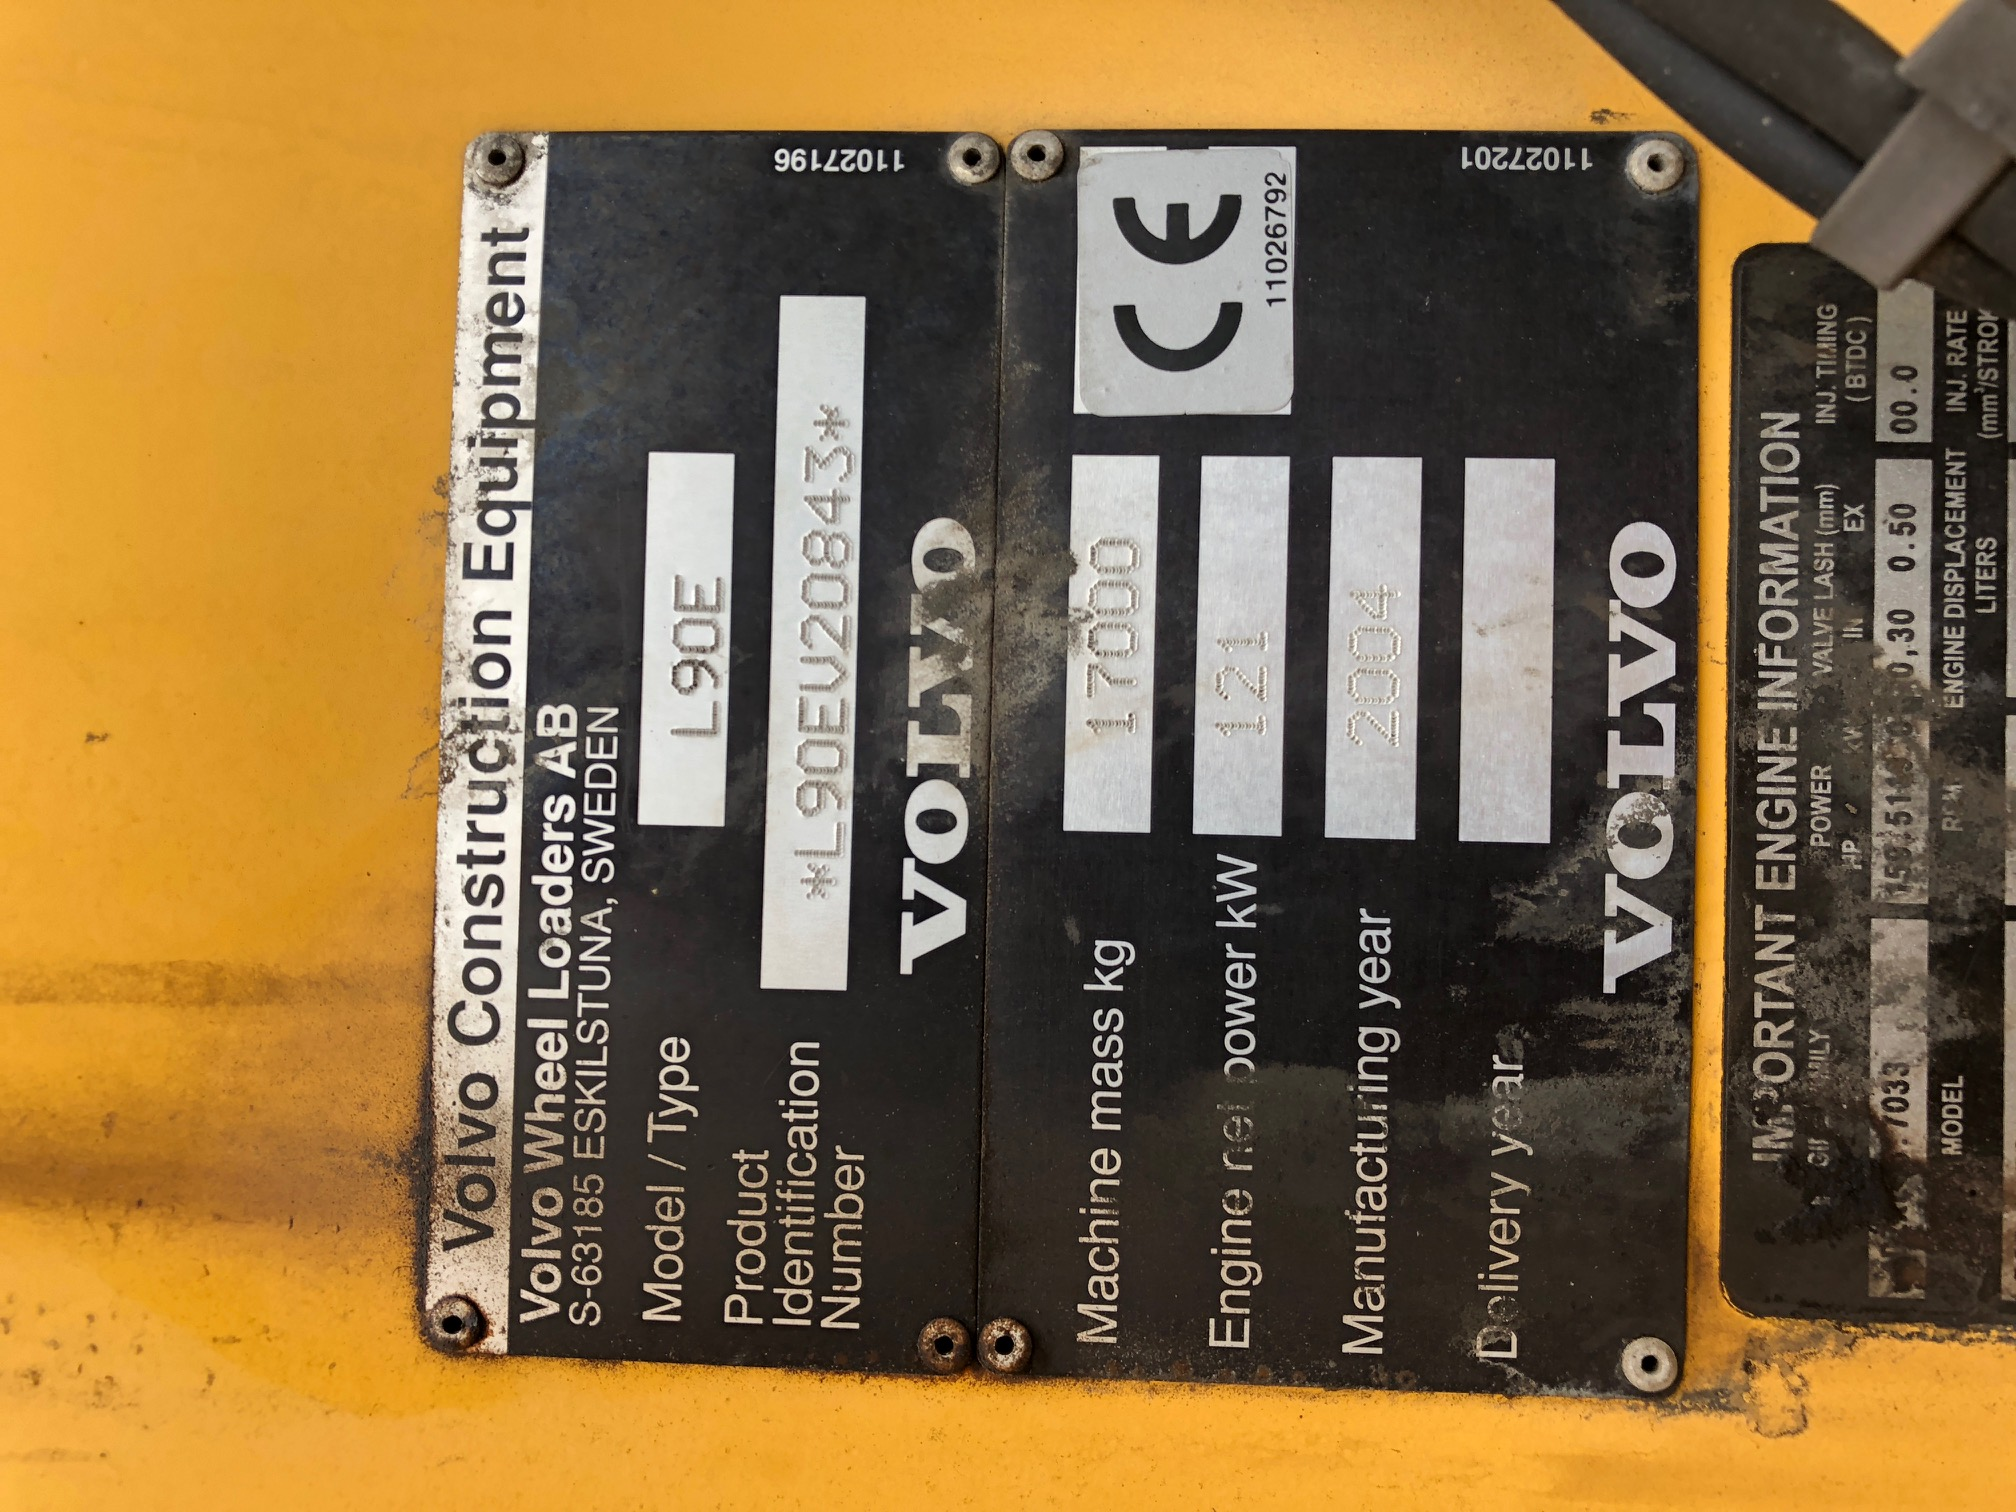 VolvoL90E_ 2004_20843_3.JPG